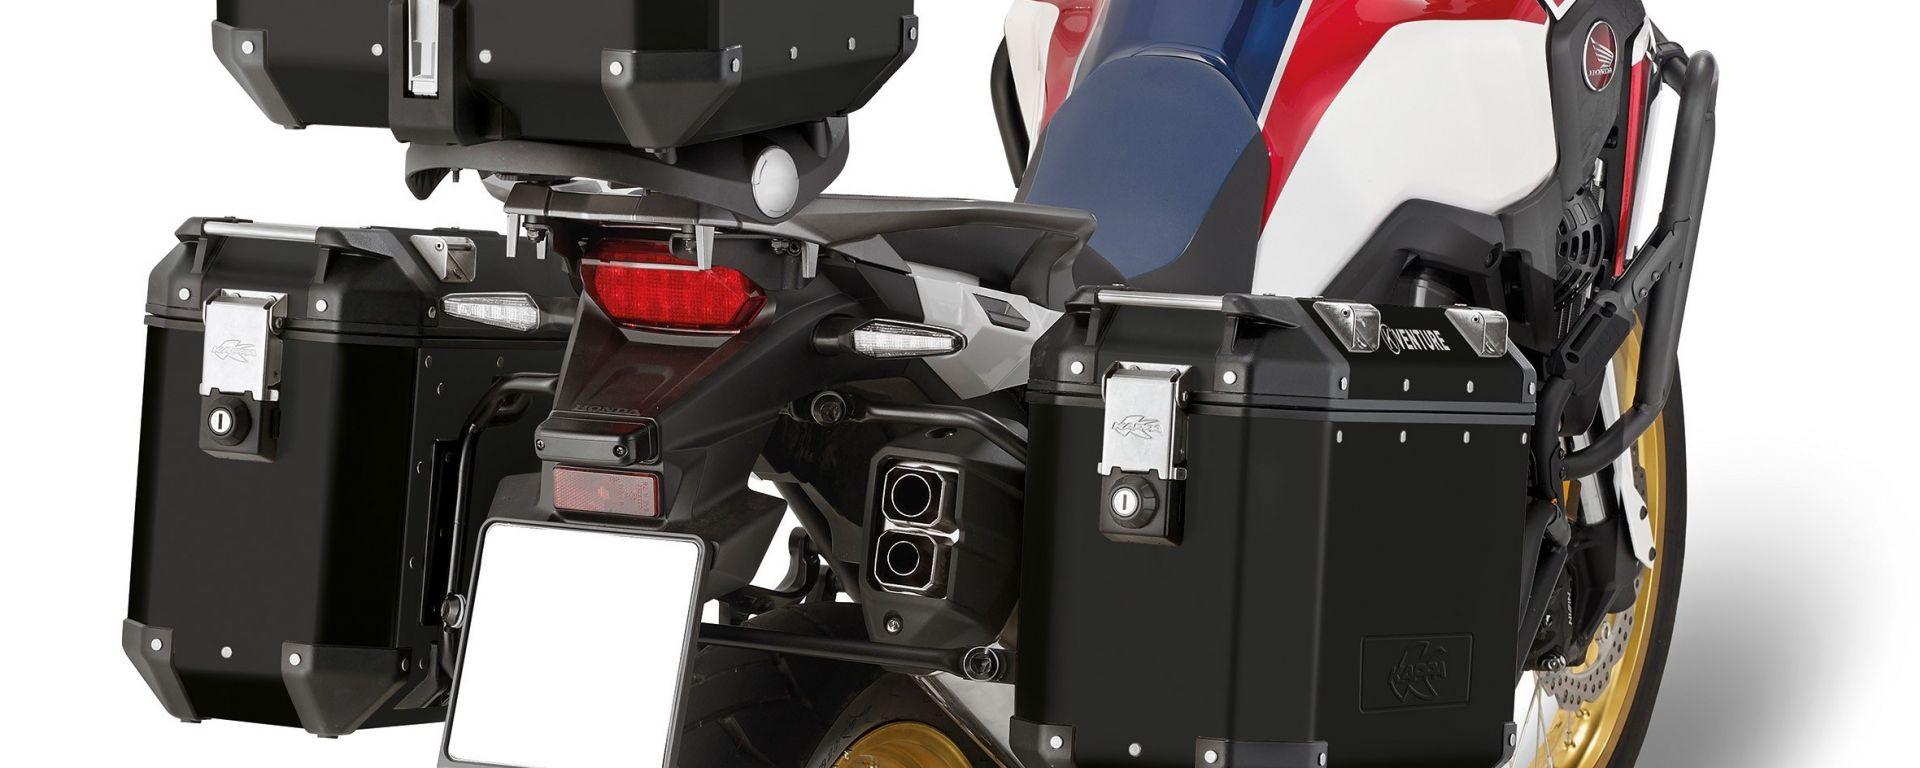 Kappa KVenture Black Line montate su Honda Africa Twin